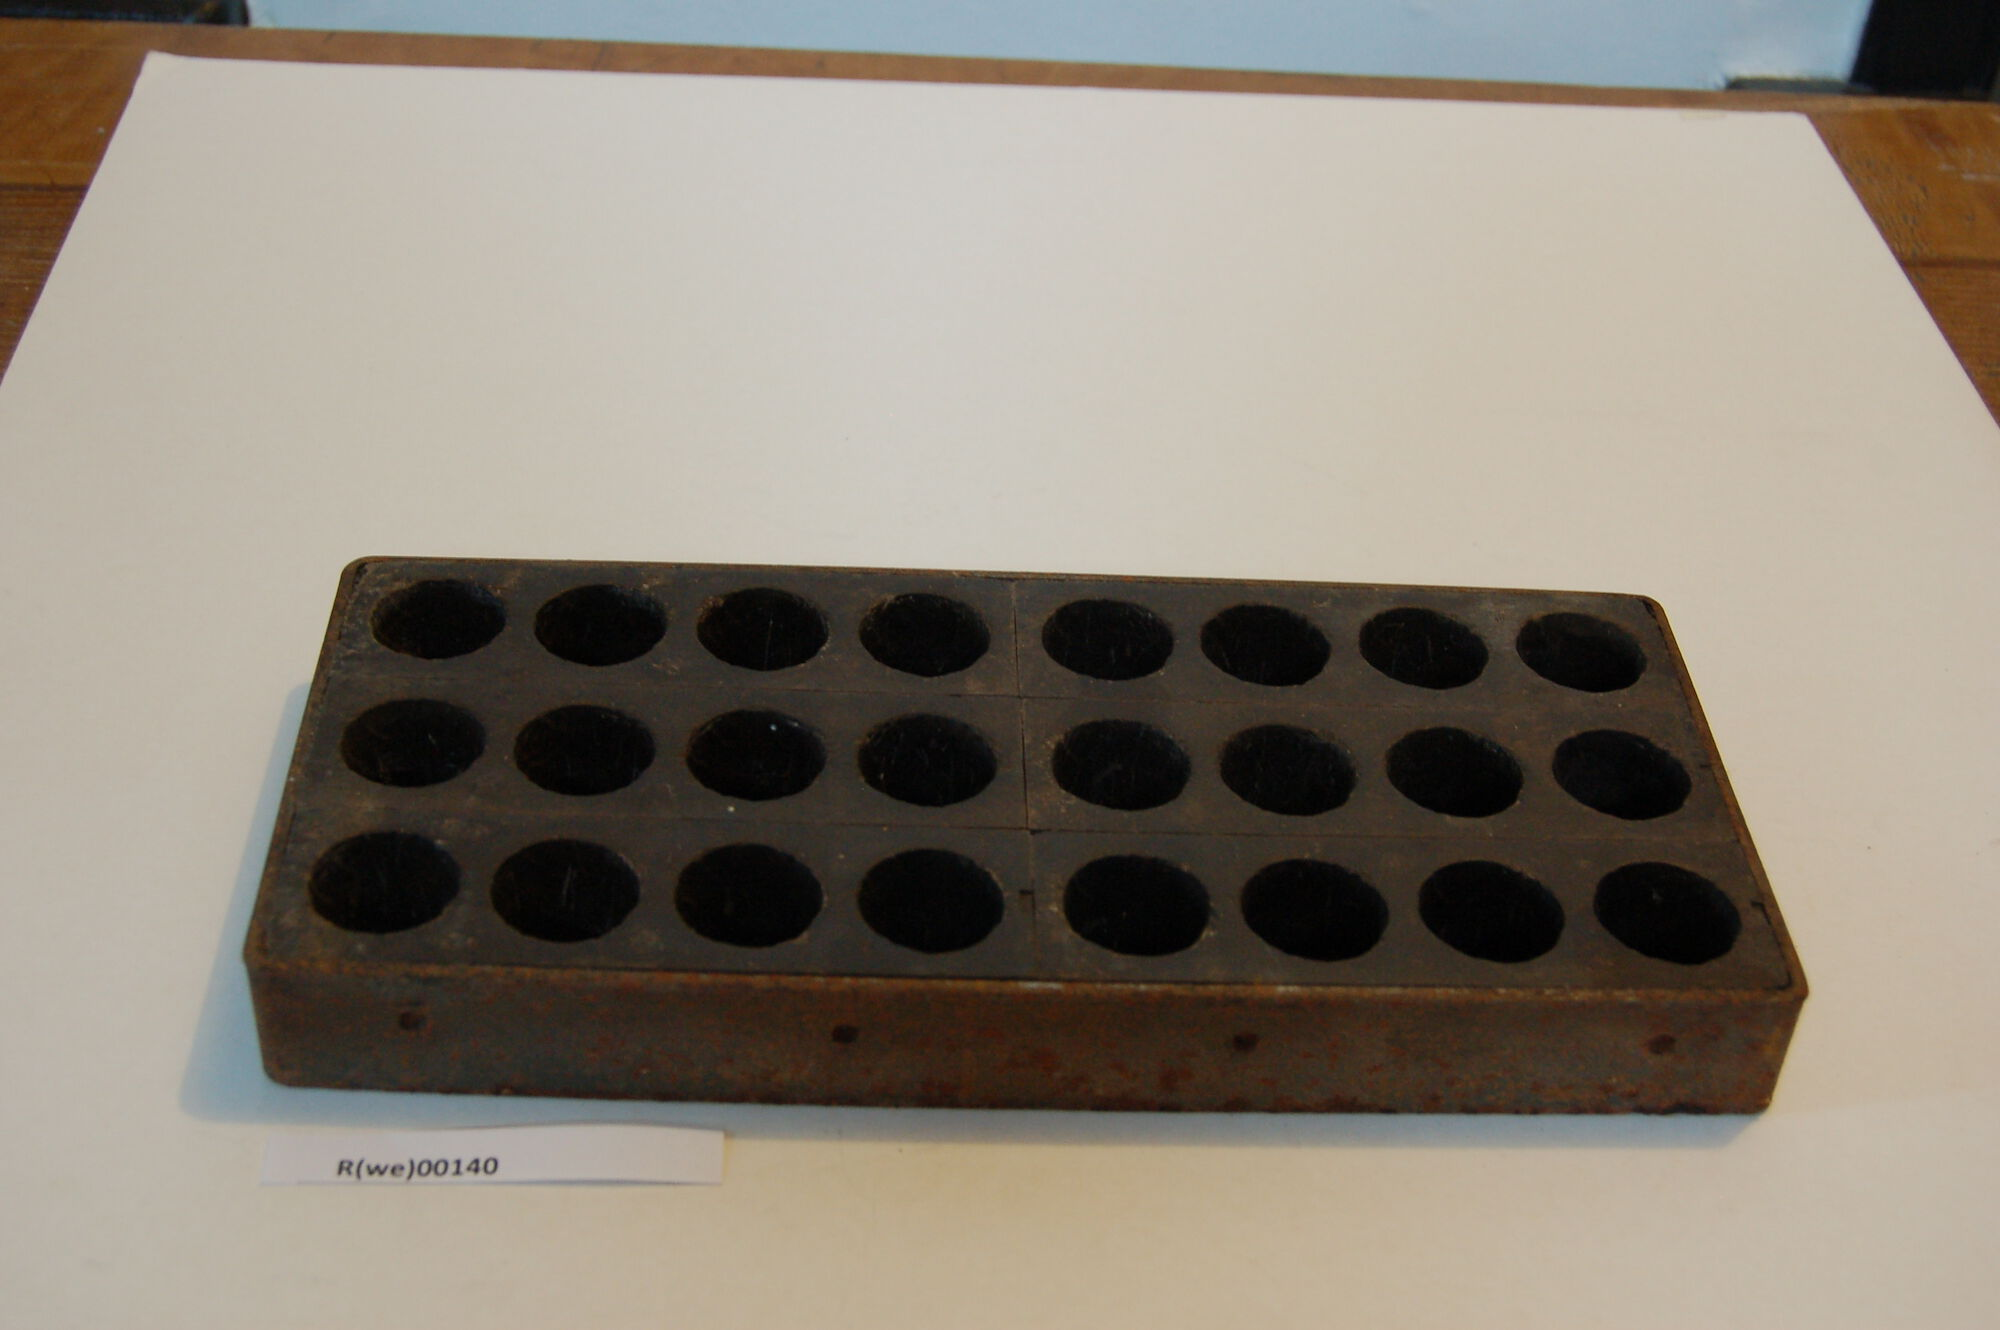 Ronse MUST: bakkersgereedschap R(we)00140.JPG